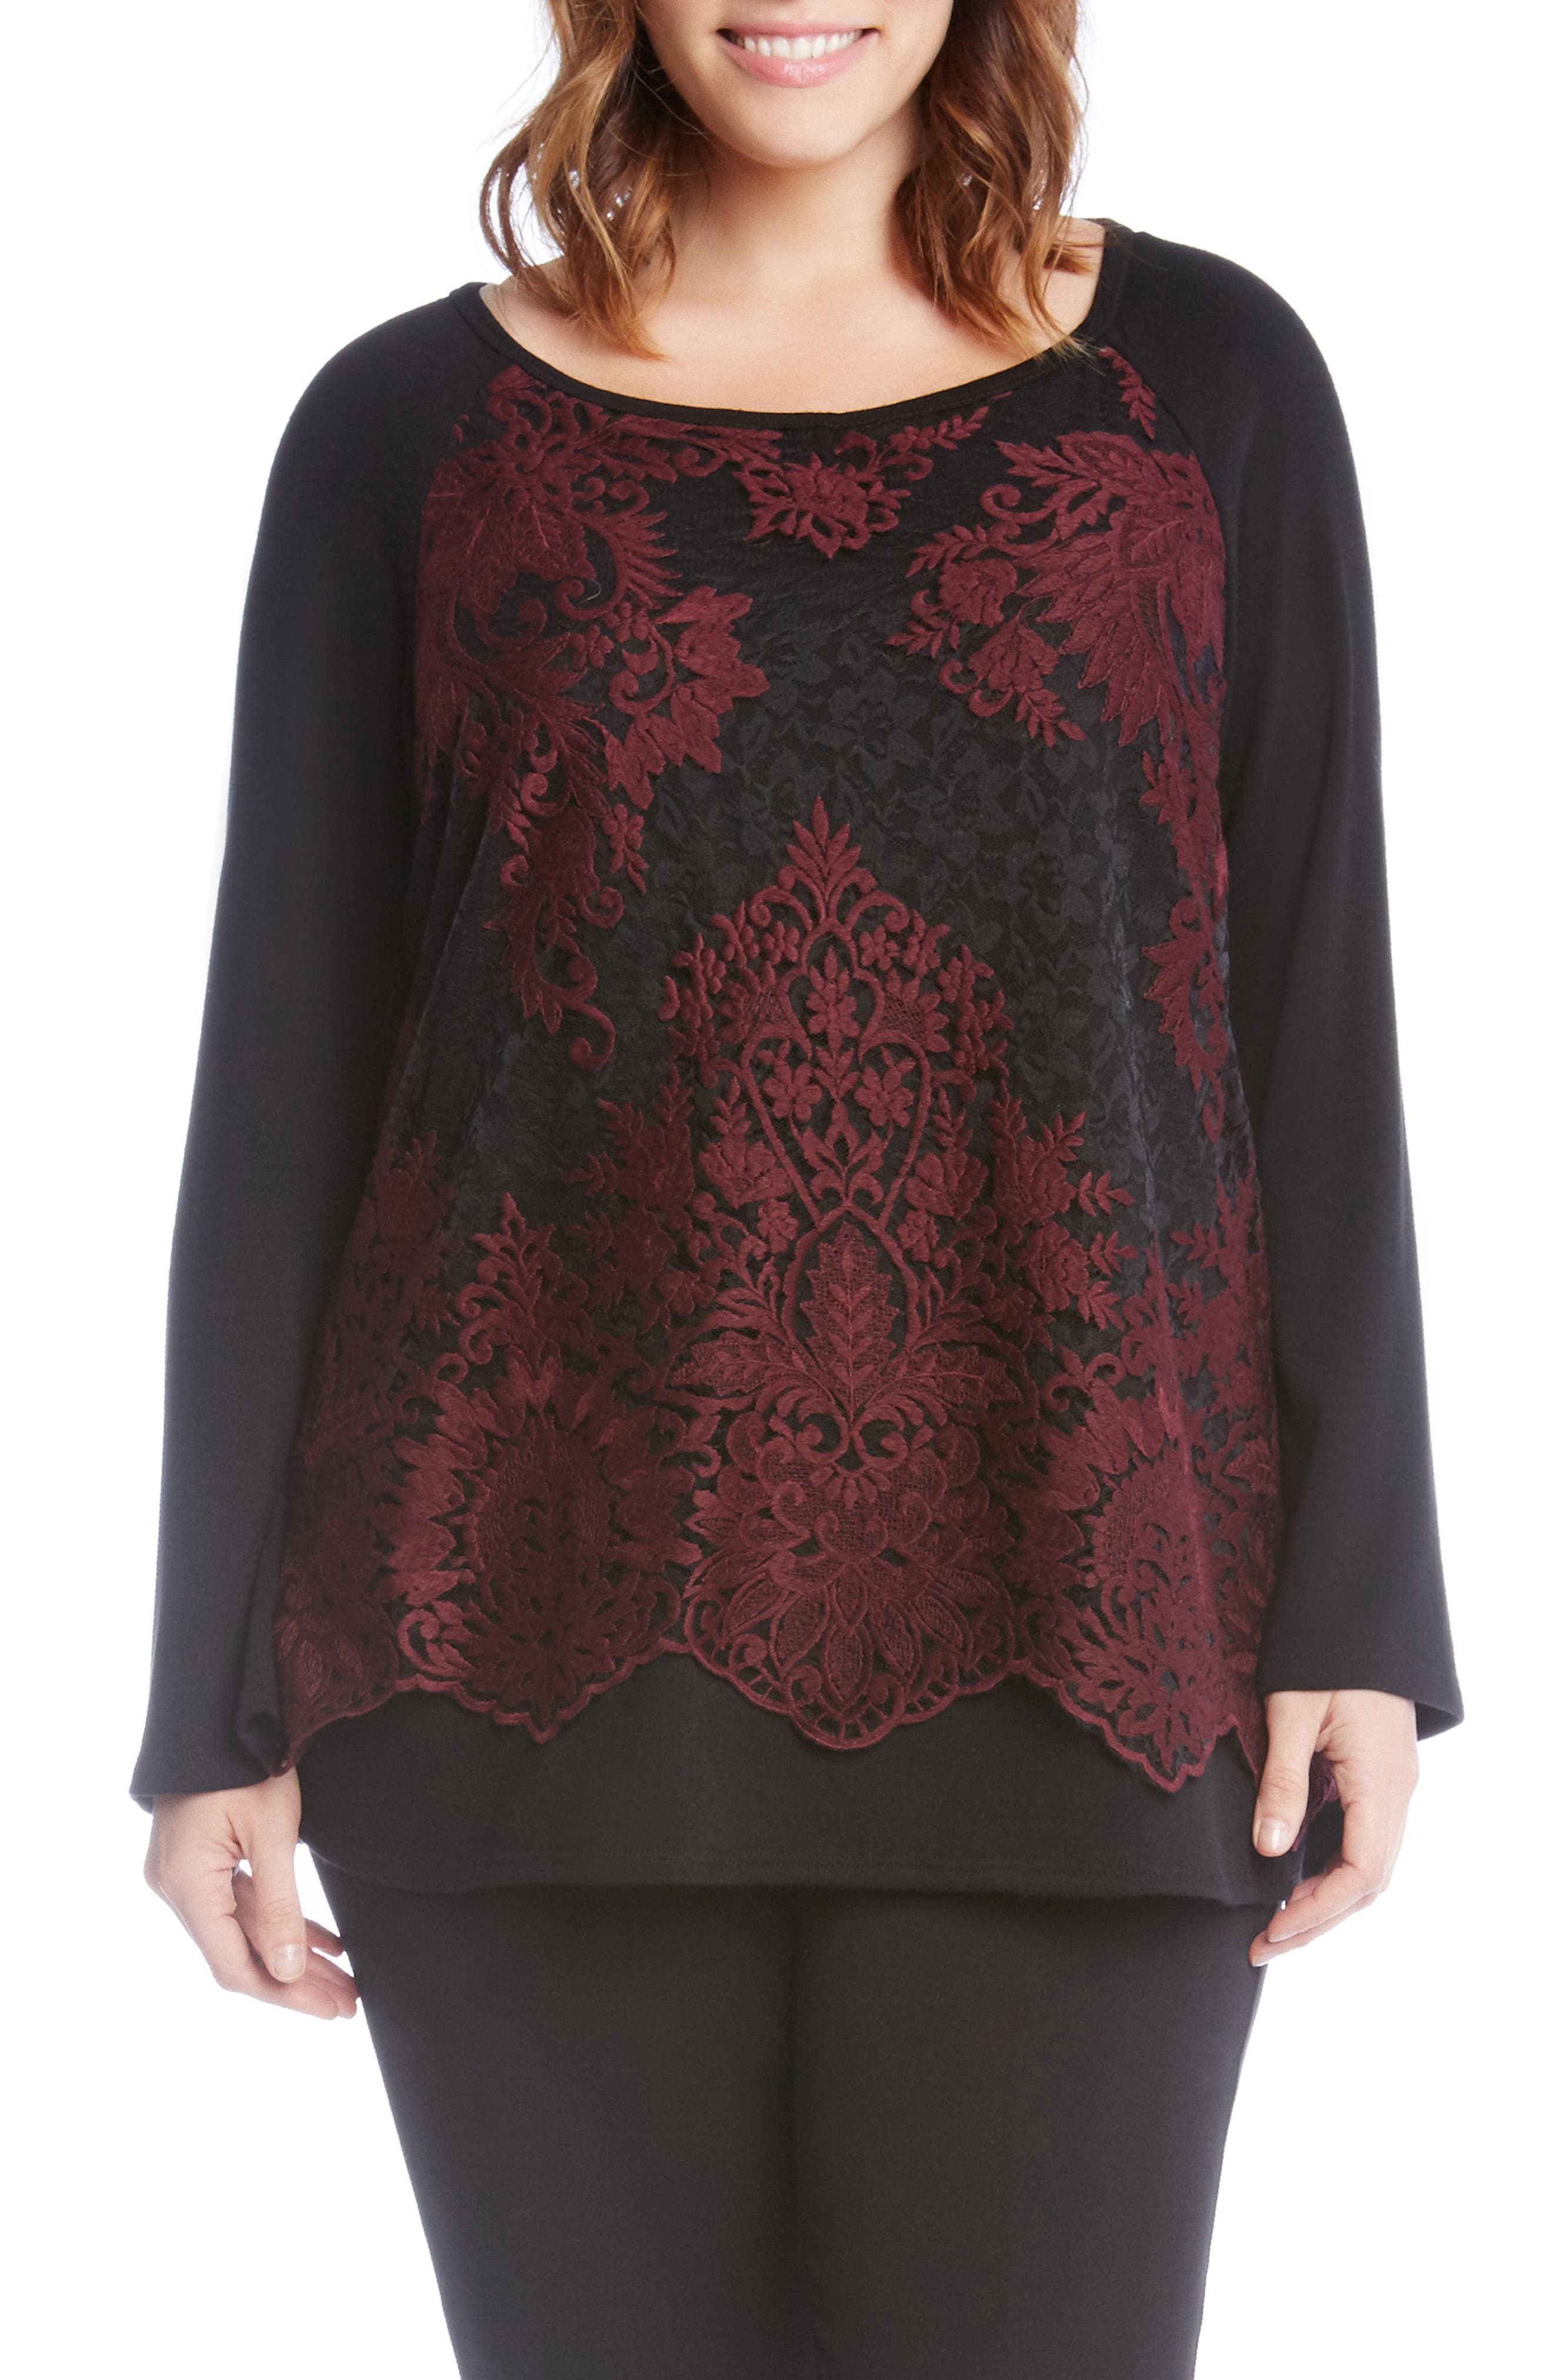 Alternate Image 1 Selected - Karen Kane Lace Overlay Jersey Top (Plus Size)